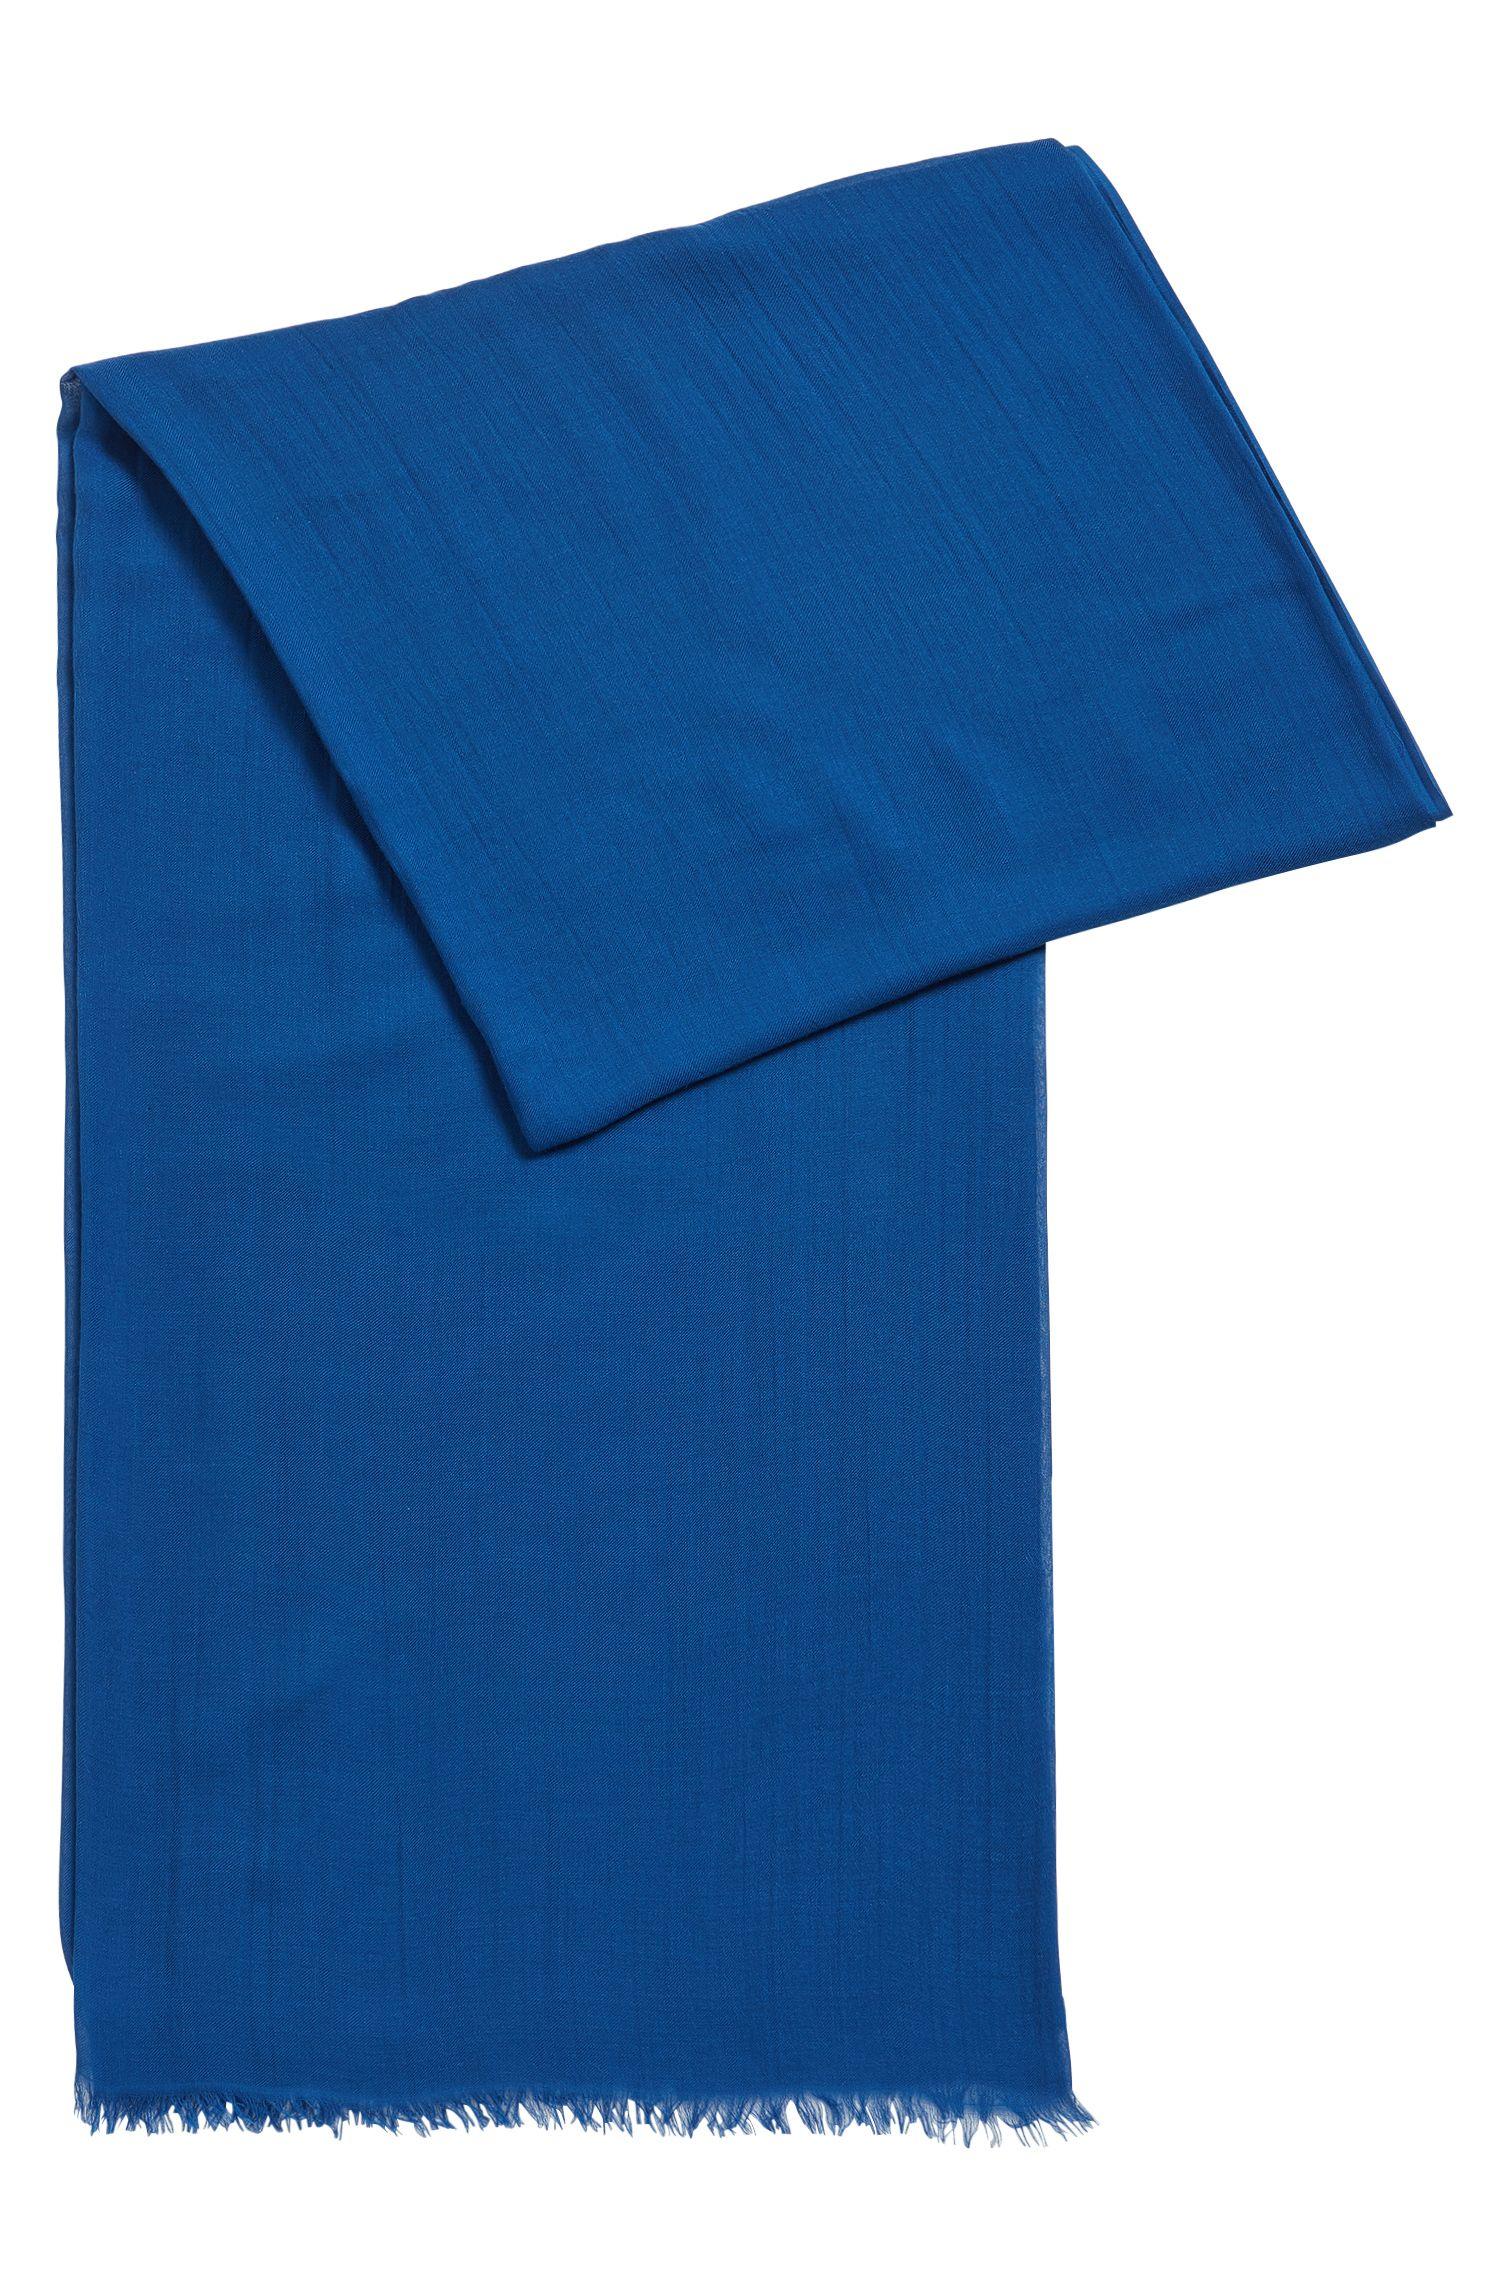 Lichte sjaal van ton-sur-ton modal